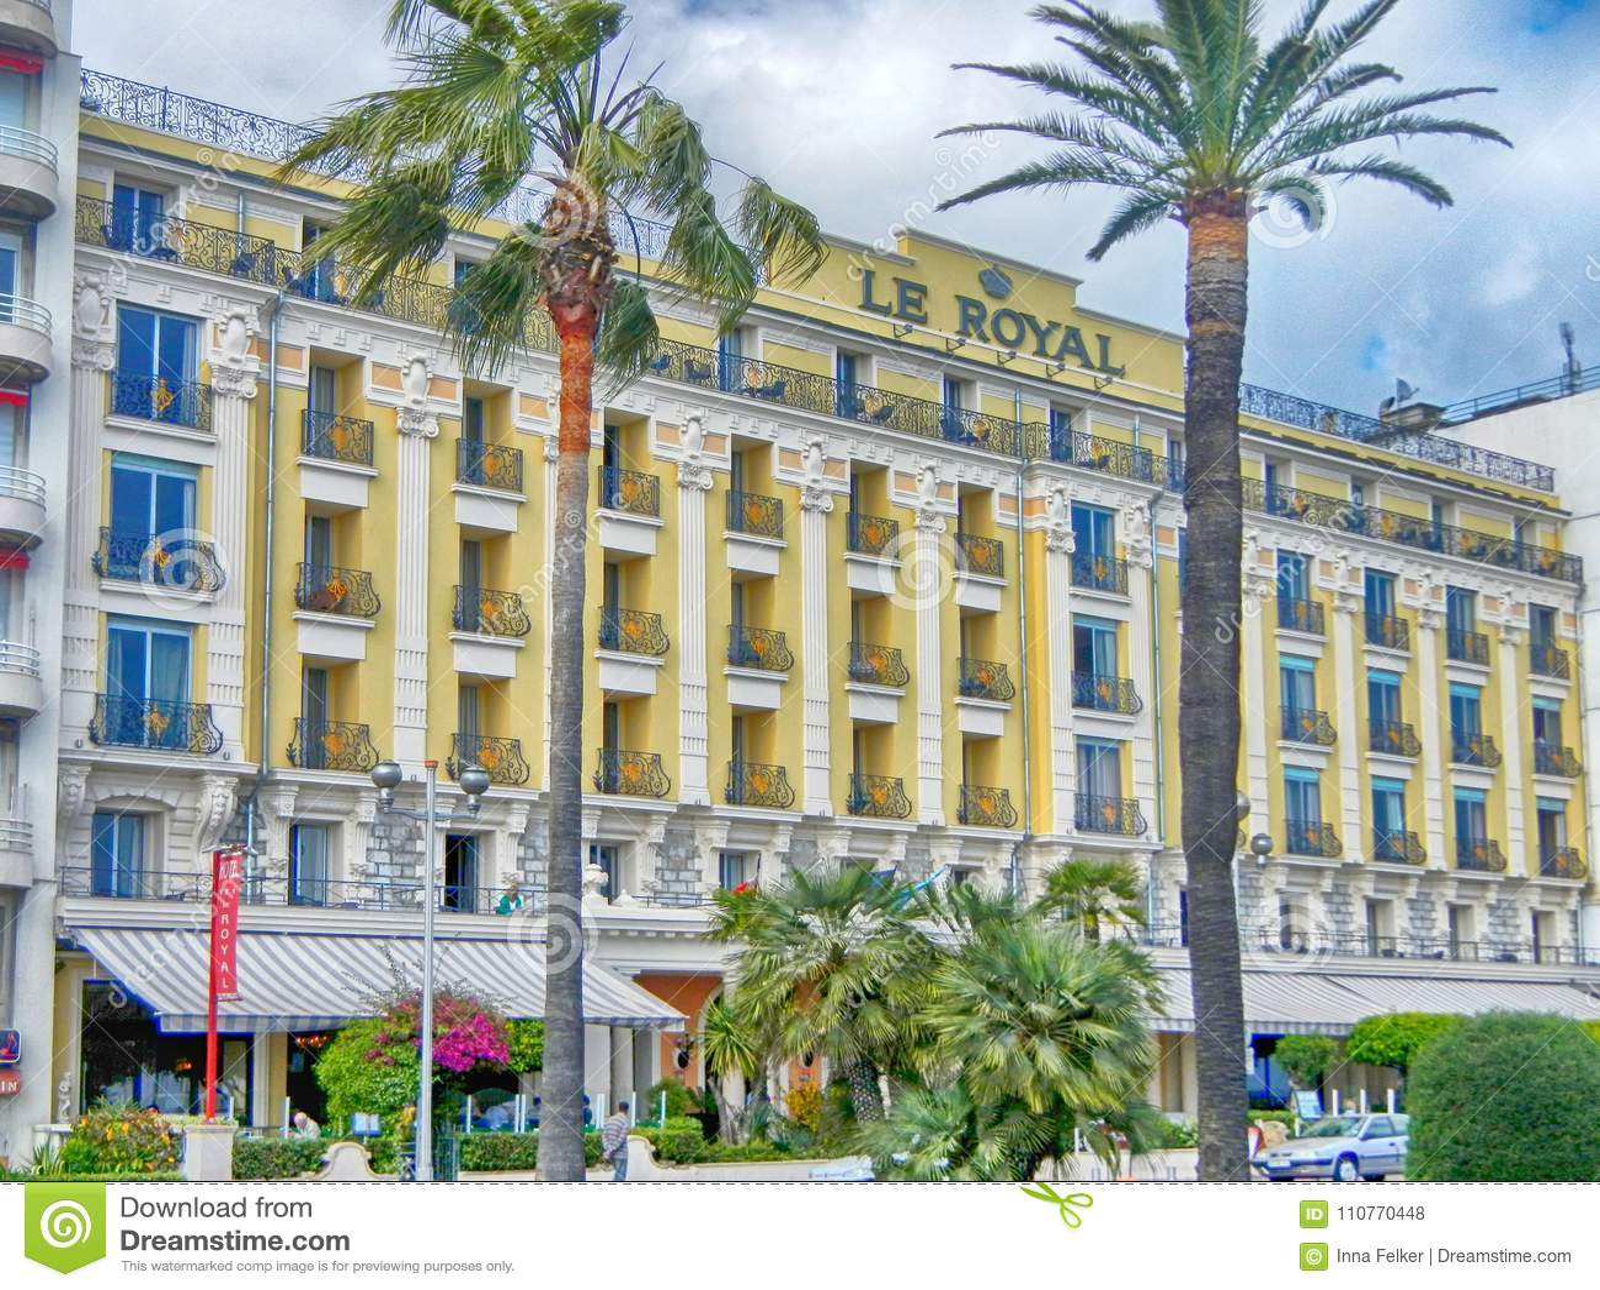 Le Royal,三个星旅馆在尼斯,法国